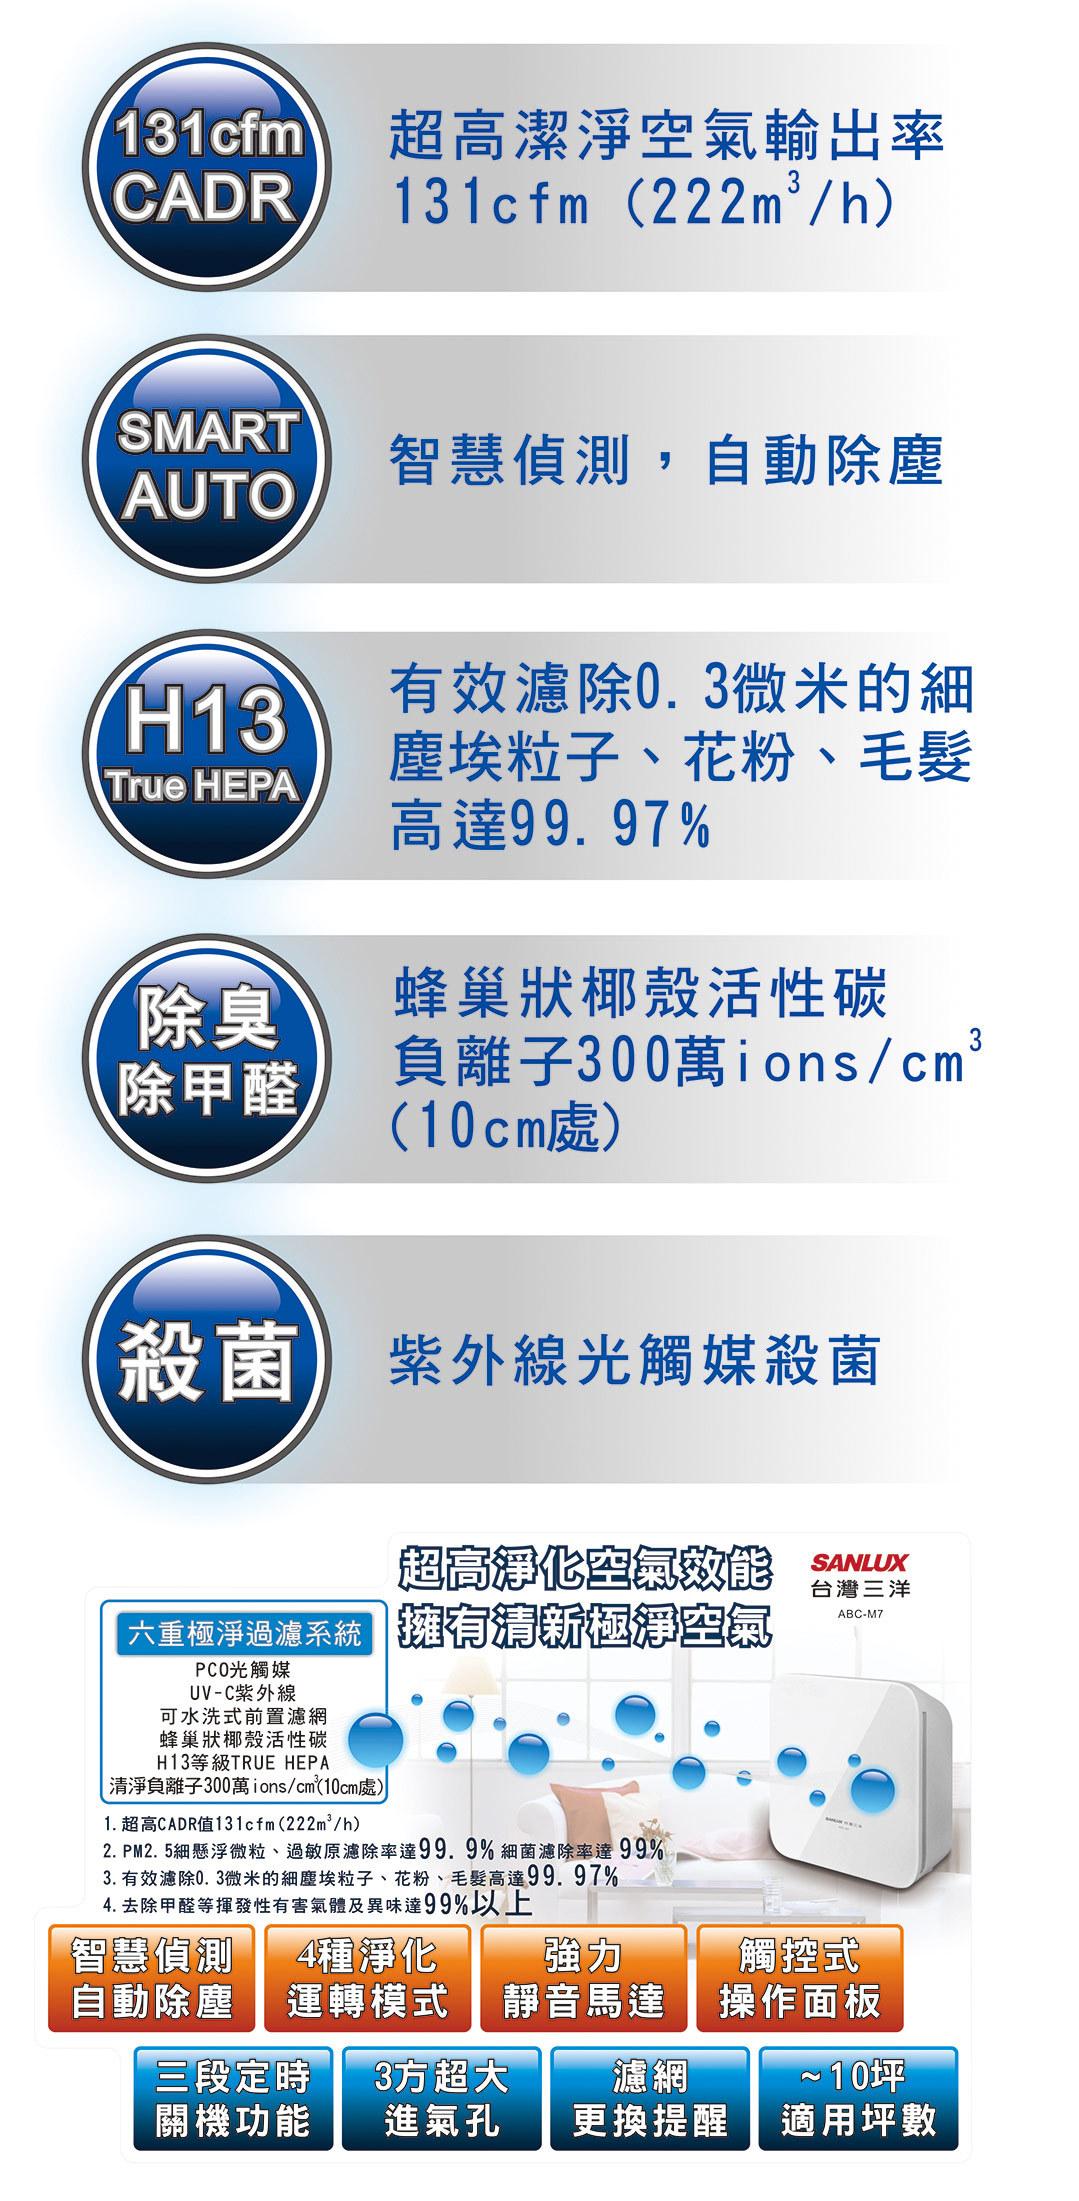 SANLUX 台灣三洋 ABC-M7 空氣清淨機 光觸媒+UV 負離子HEPA13